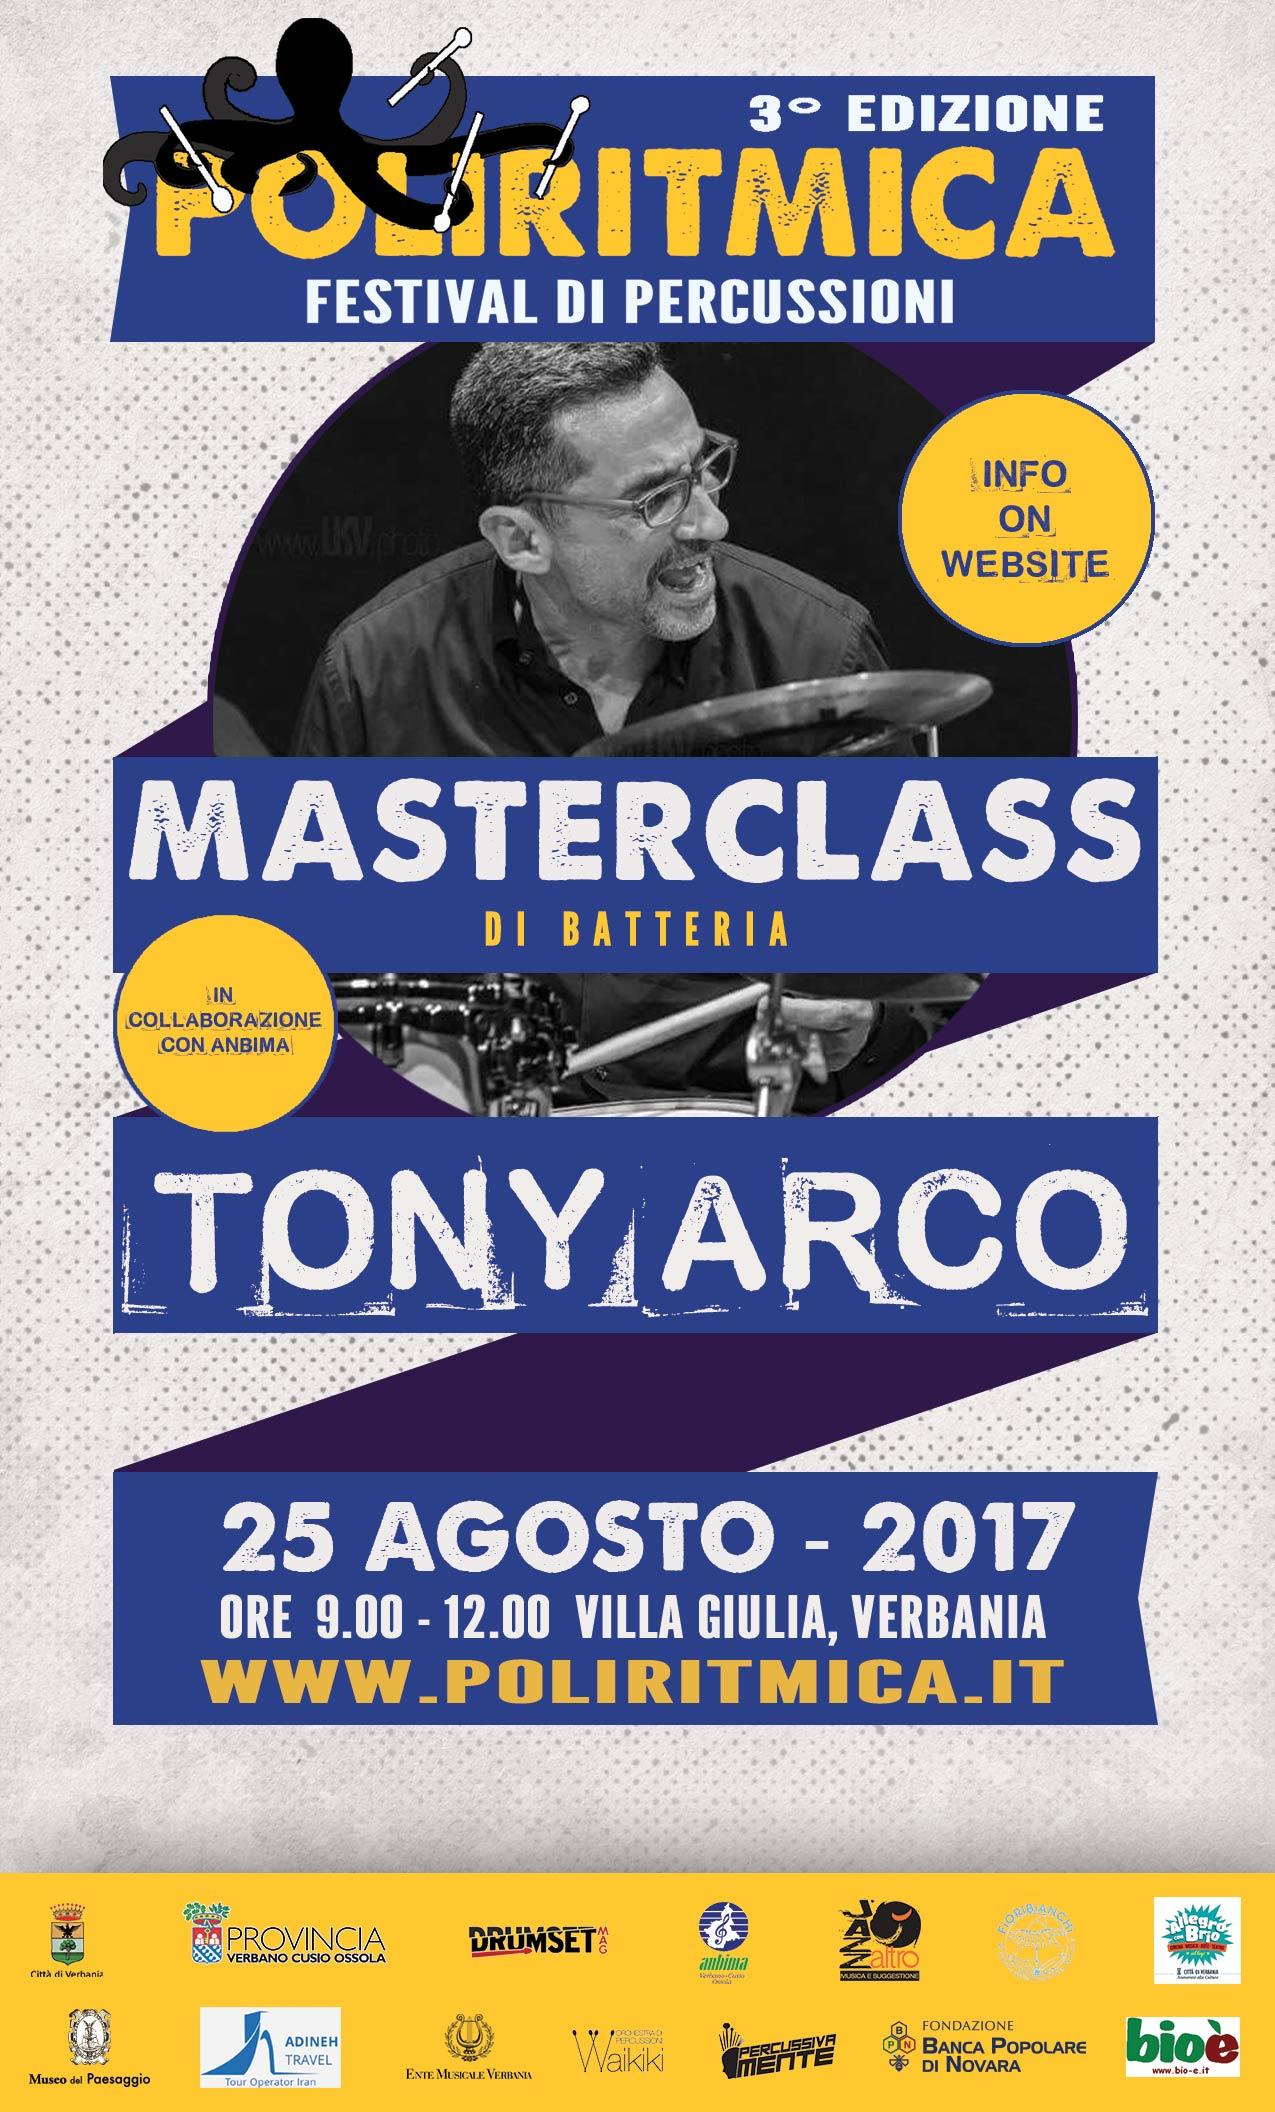 25 agosto h 9 Tony_arco